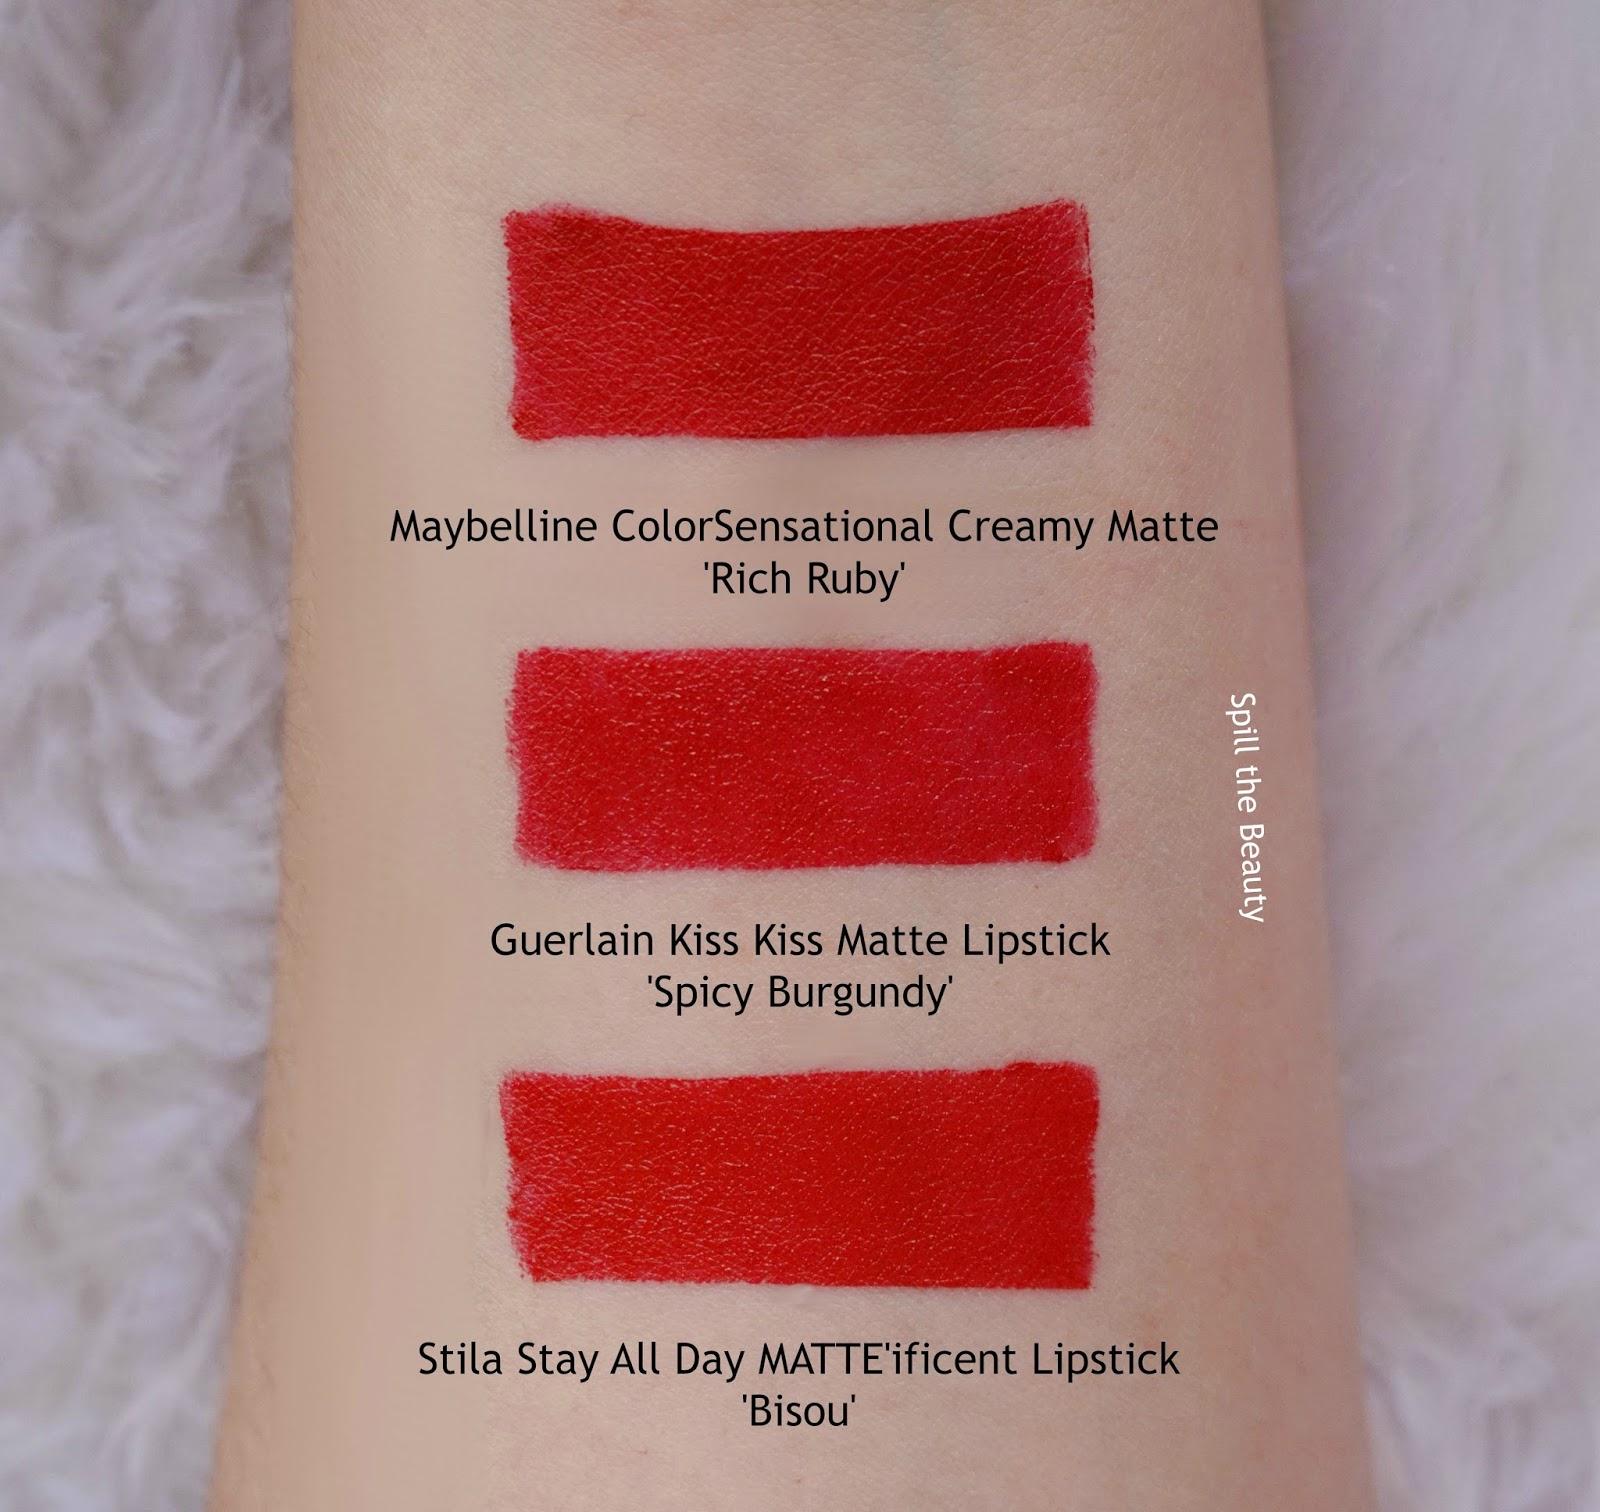 guerlain kiss kiss matte lipstick spicy burgundy swatches comparison dupe stila maybelline